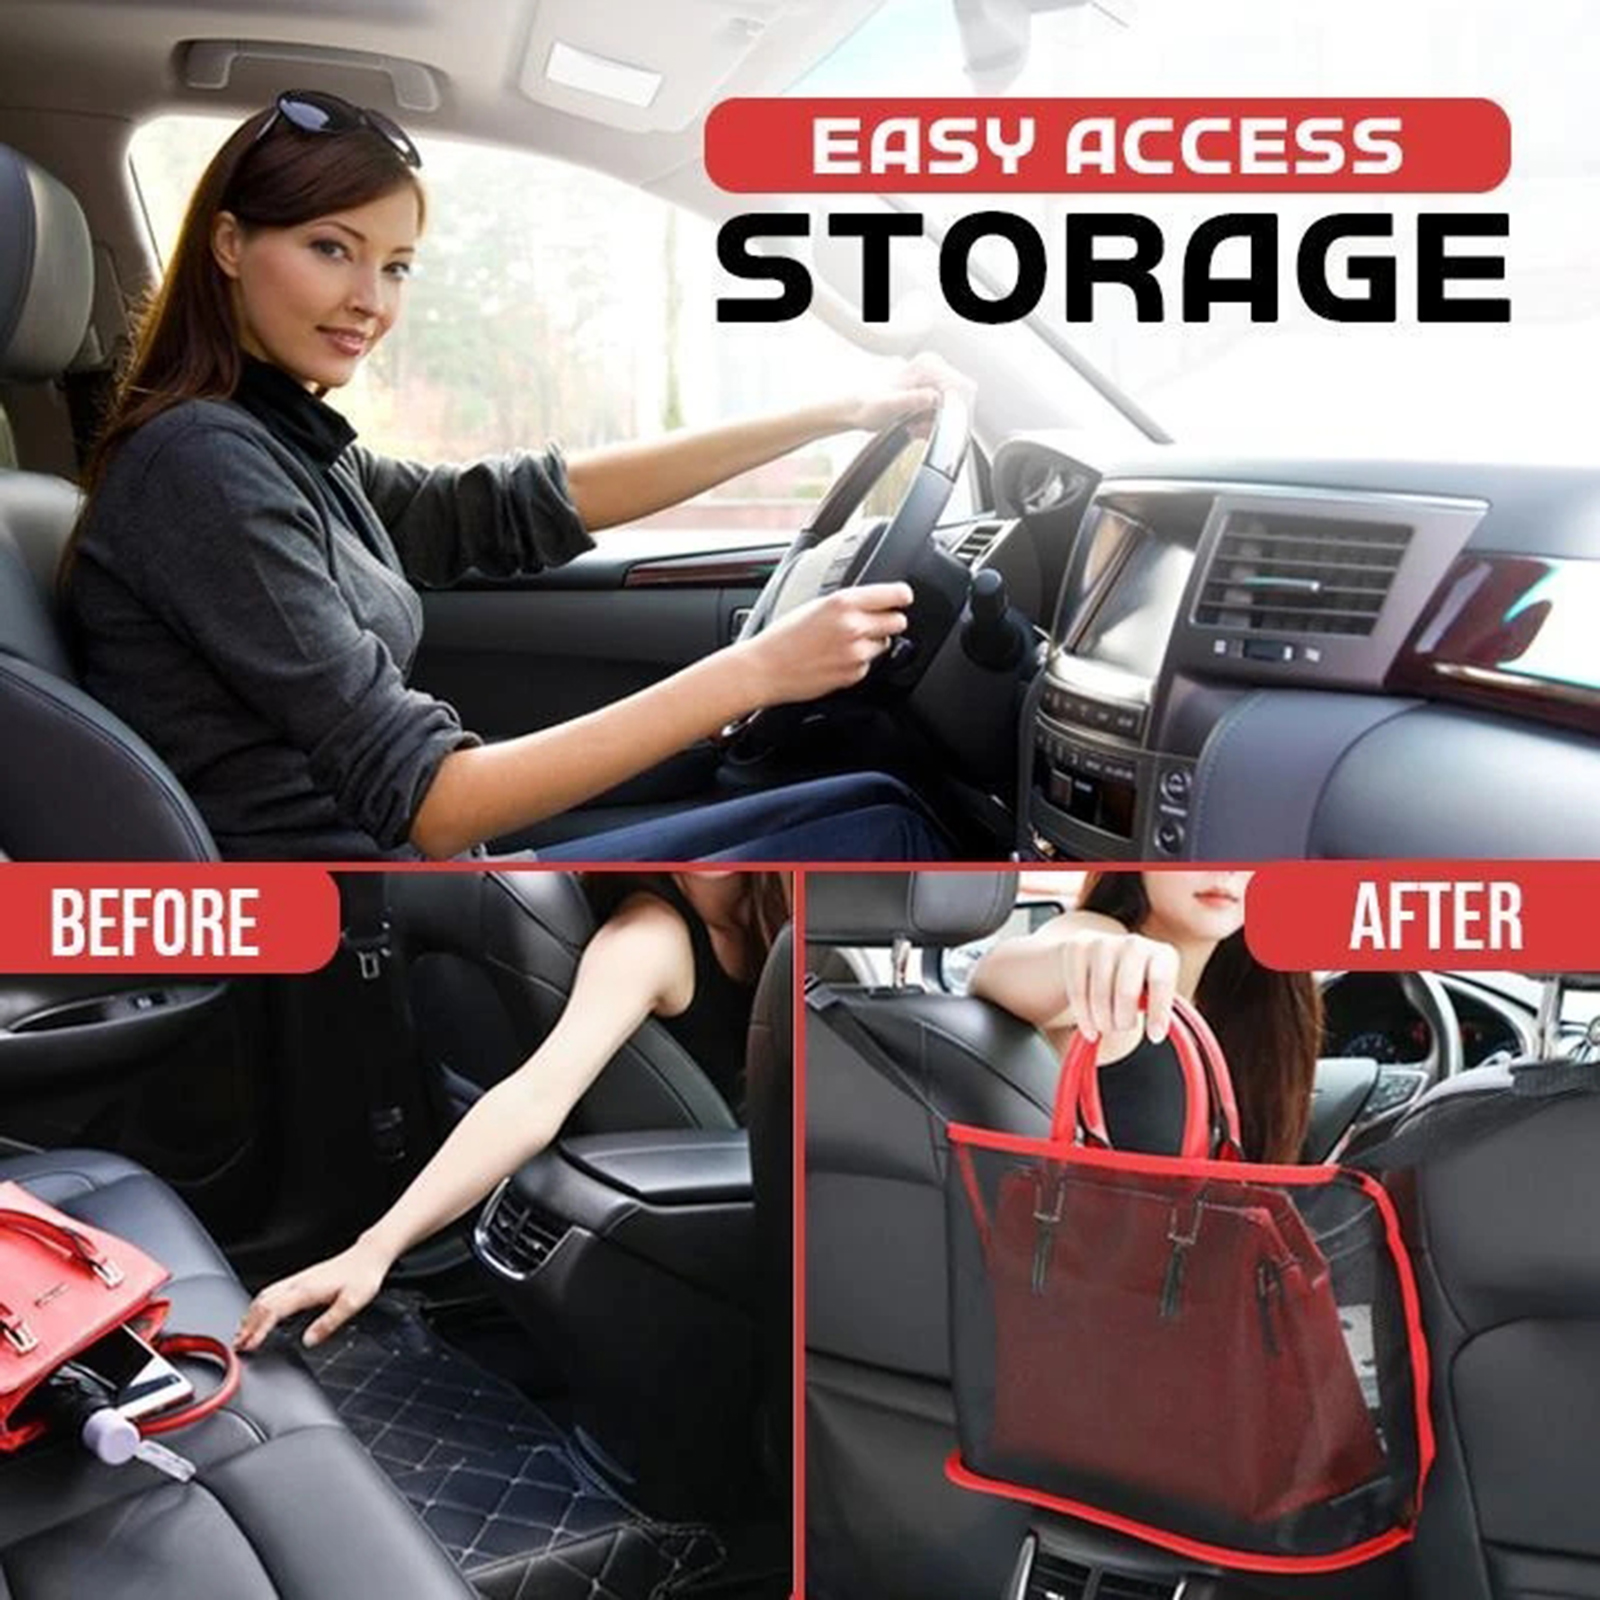 Car Net Pocket Handbag Holder for Handbag Bag Documents Phone Valuable Items(handbag shown in picture is not included) 1